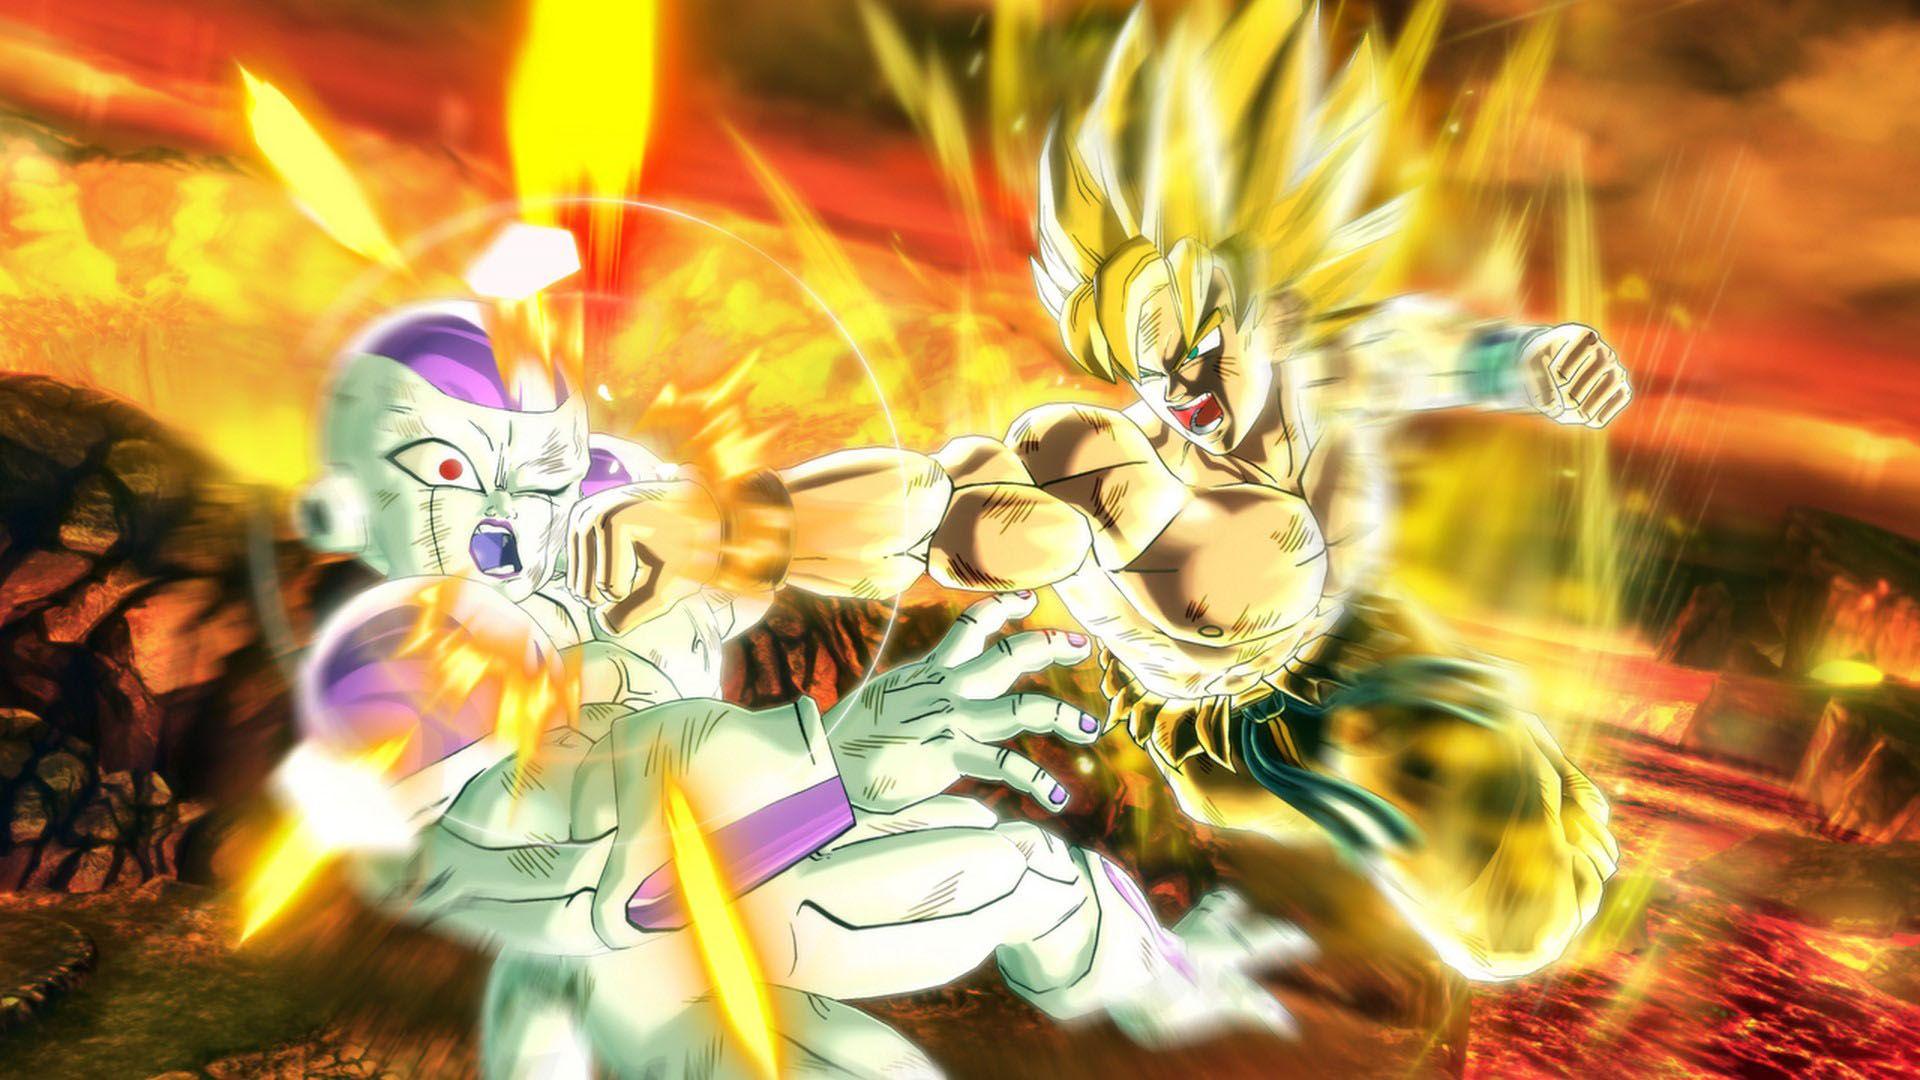 Goku Super Saiyan Wallpaper Posted By Christopher Johnson